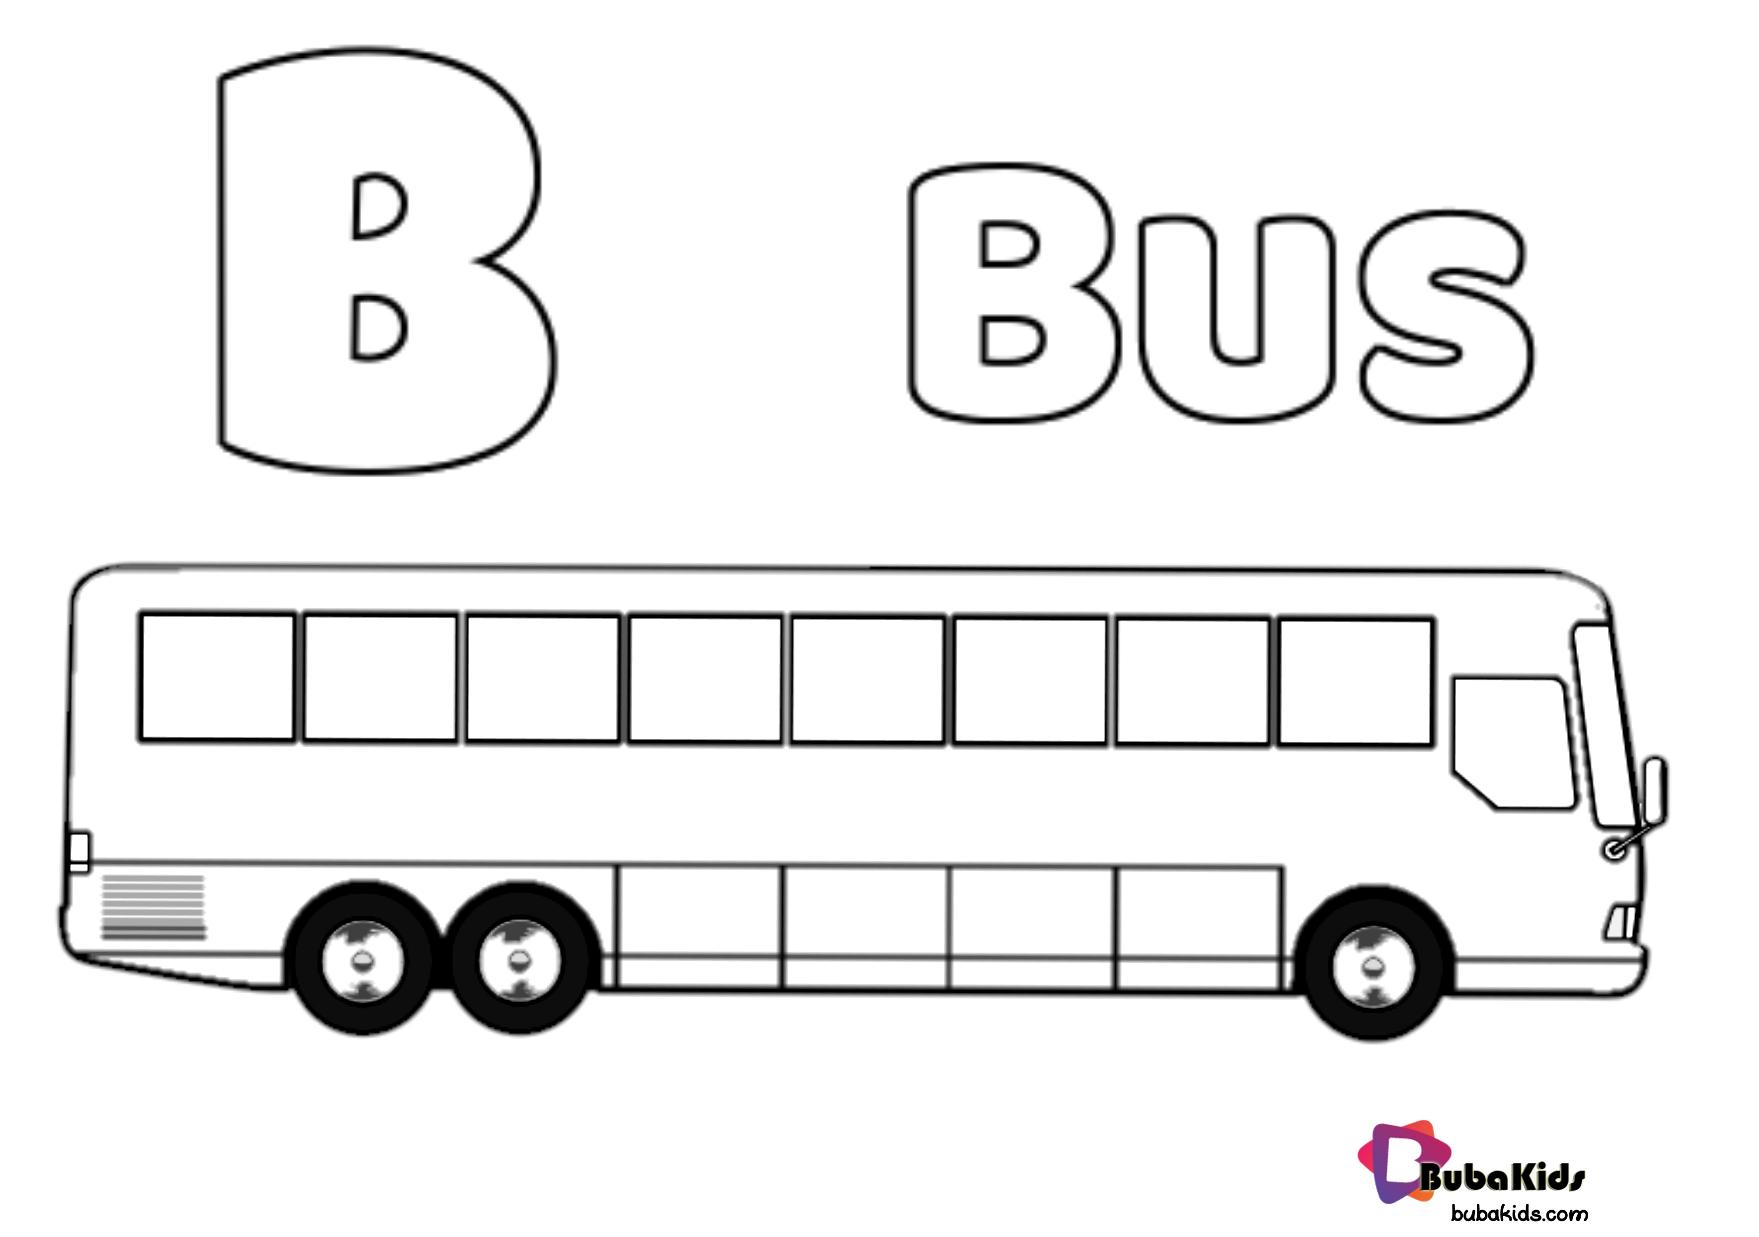 Alphabet B For Bus Coloring Page Printable Alphabet Bubakids Com Bus City Bus School Bus Transportations Alph Coloring Pages Bus Cartoon Coloring Pages